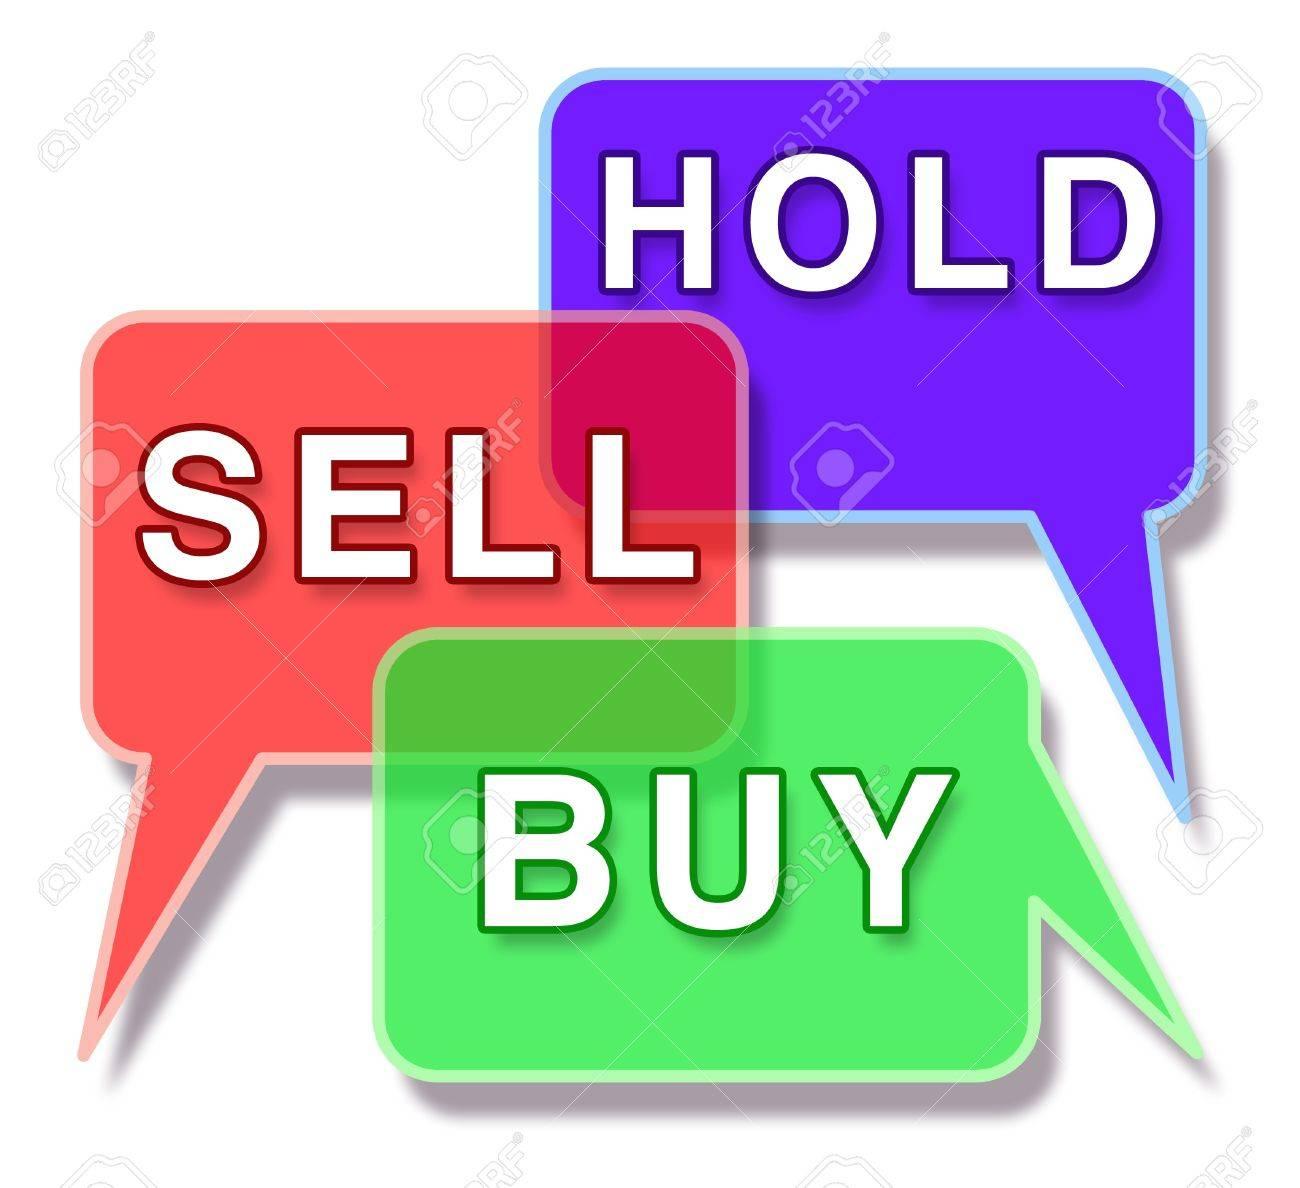 Bigdil Nigeria Limited Stock Market Symbol Photo Binary Options